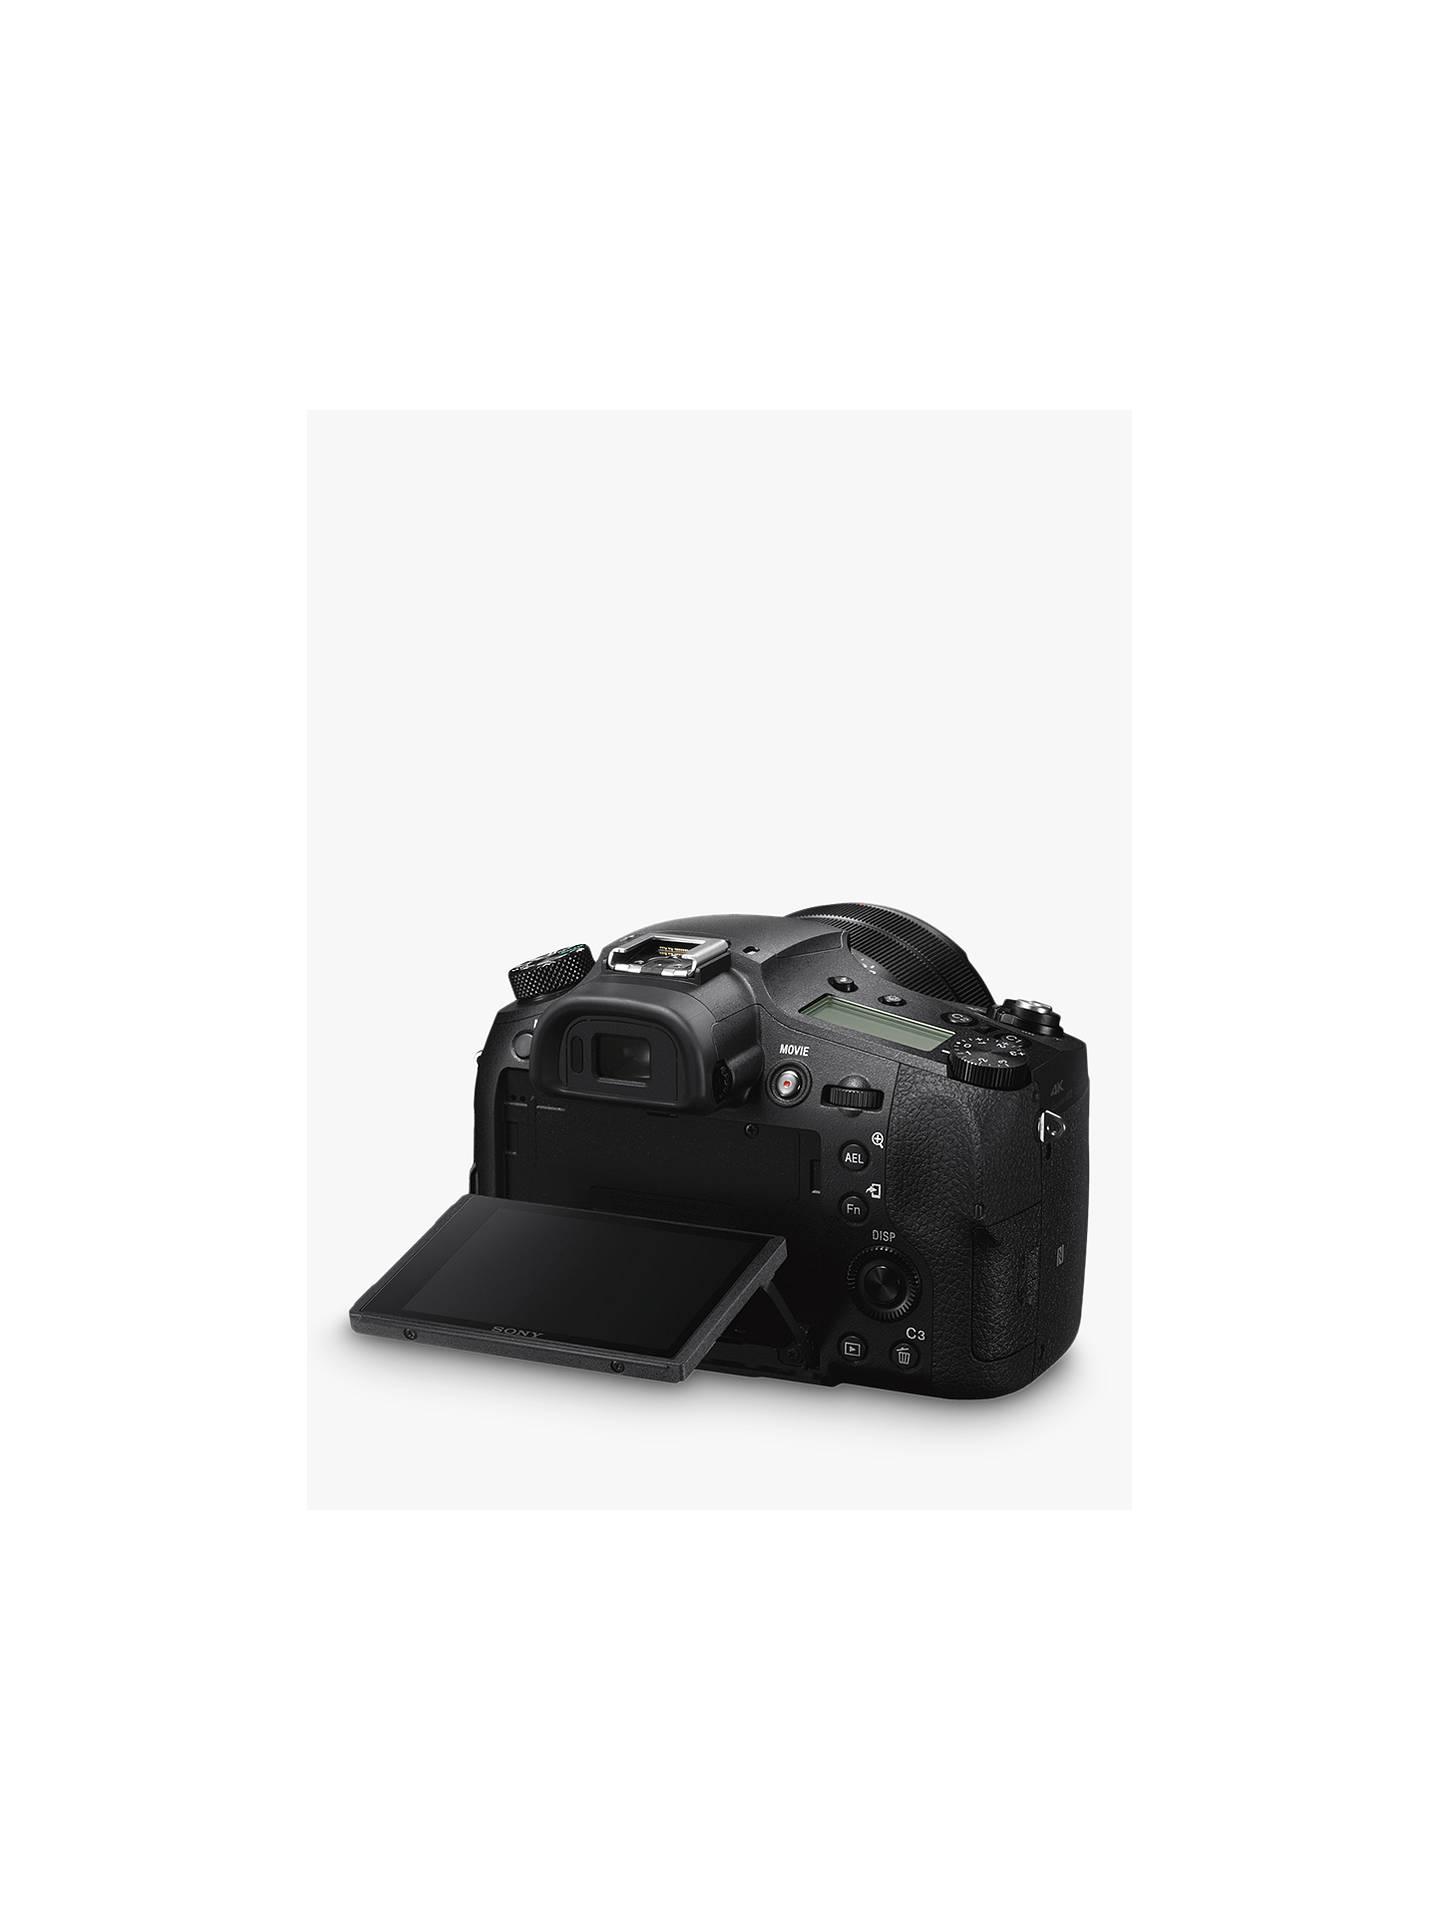 Sony Cyber-Shot DSC-RX10 IV Bridge Camera, 4K Ultra HD, 20 1MP, 25x Optical  Zoom, Wi-Fi, NFC, EVF, 3